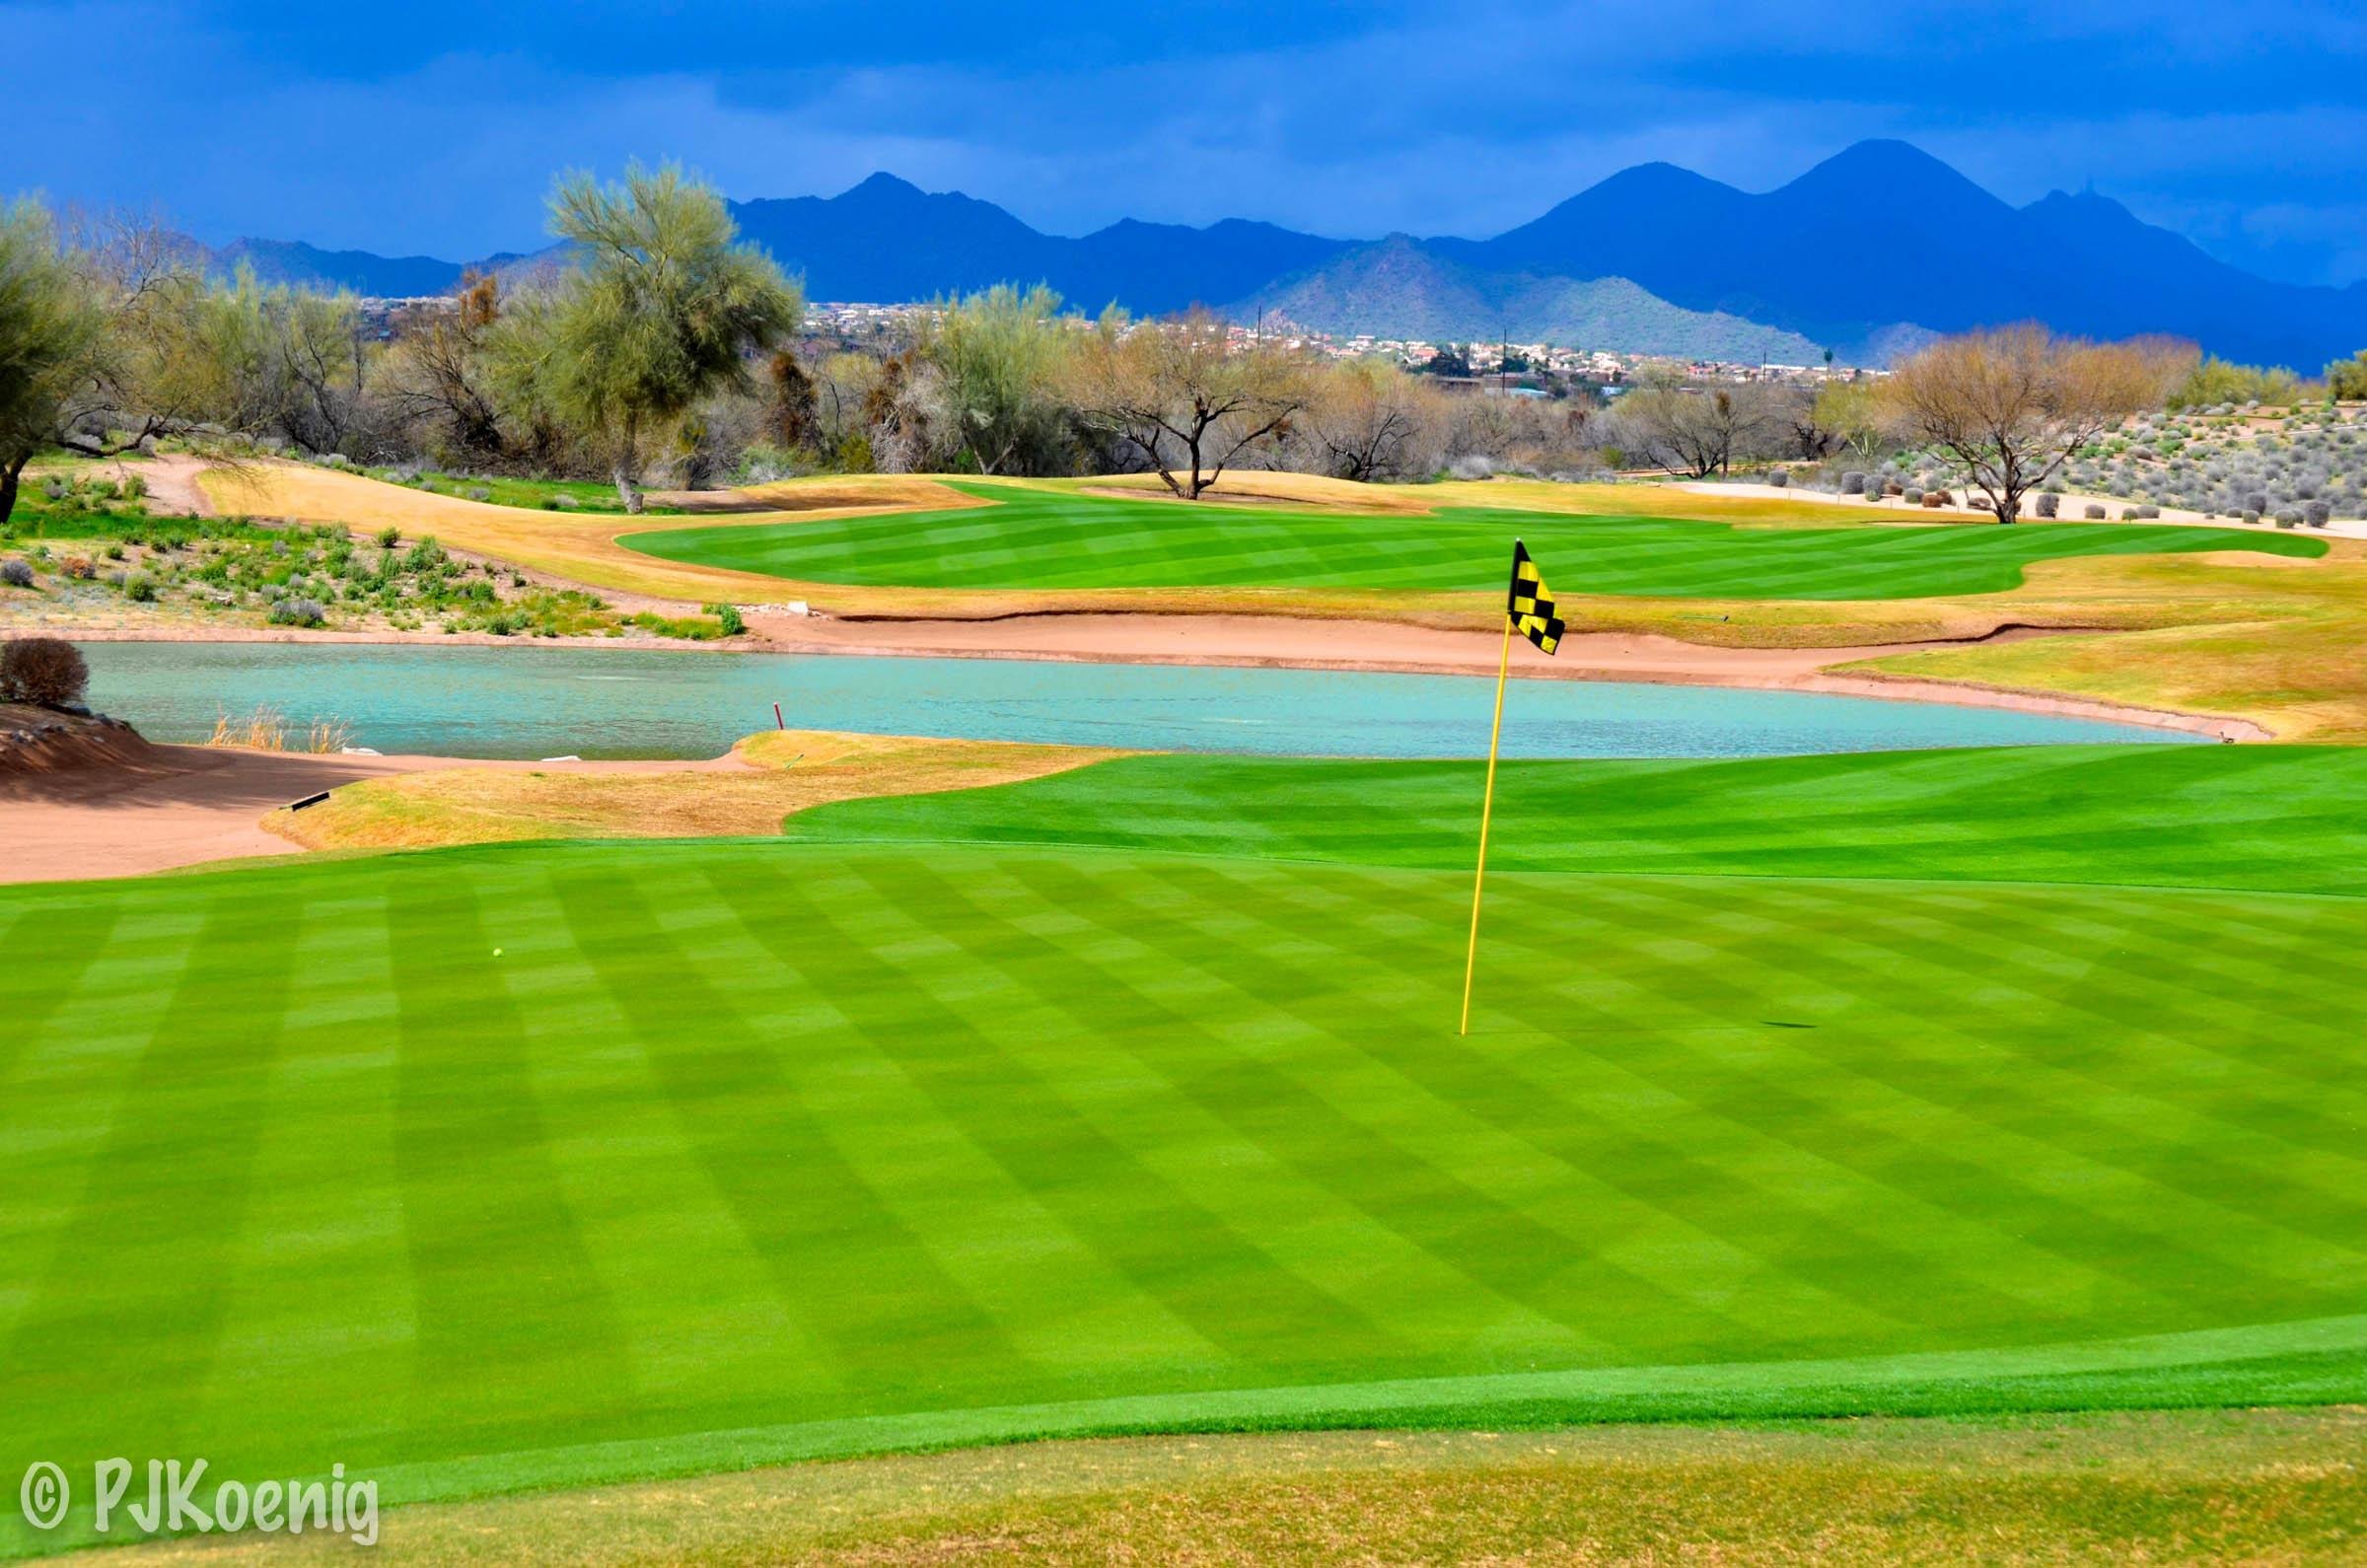 We-Ko-Pa Golf Club - Fort McDowell, AZ